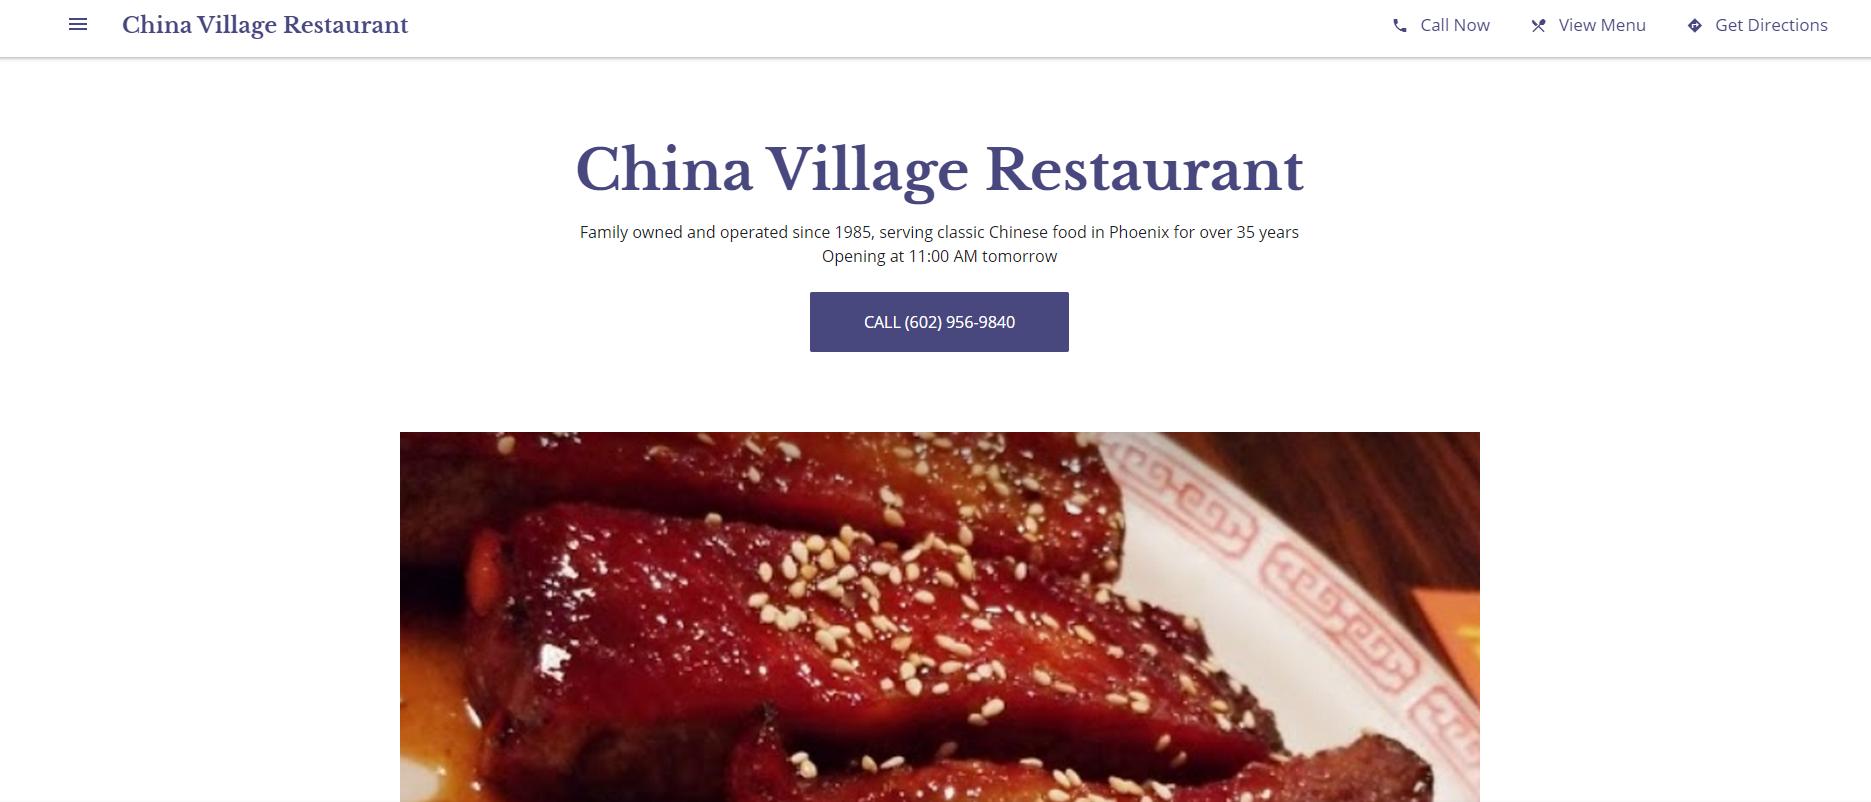 5Chinese Restaurants in Phoenix